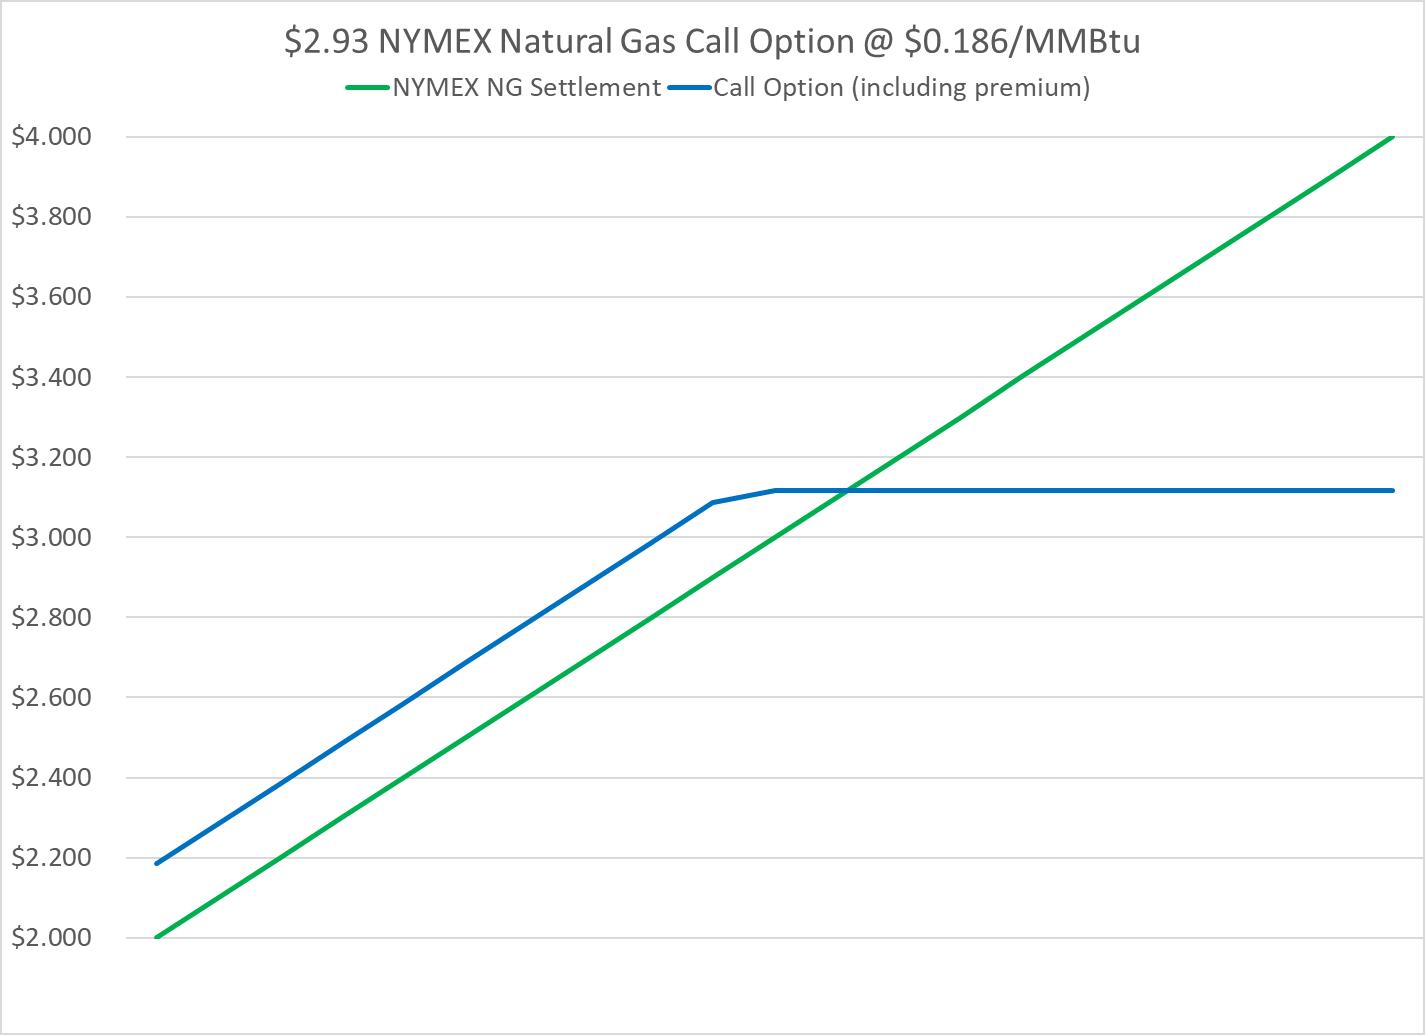 NYMEX-natural-gas-call-option-example